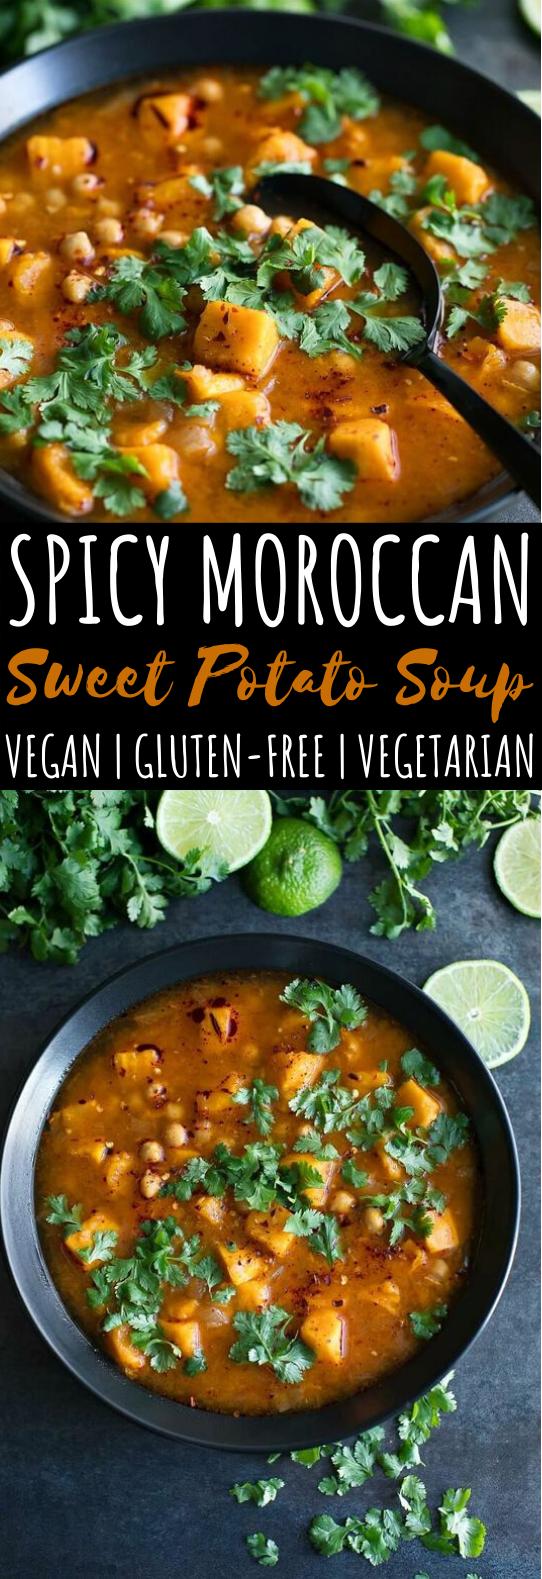 Spicy Moroccan Sweet Potato Soup #vegan #dinner #soup #stew #meatless